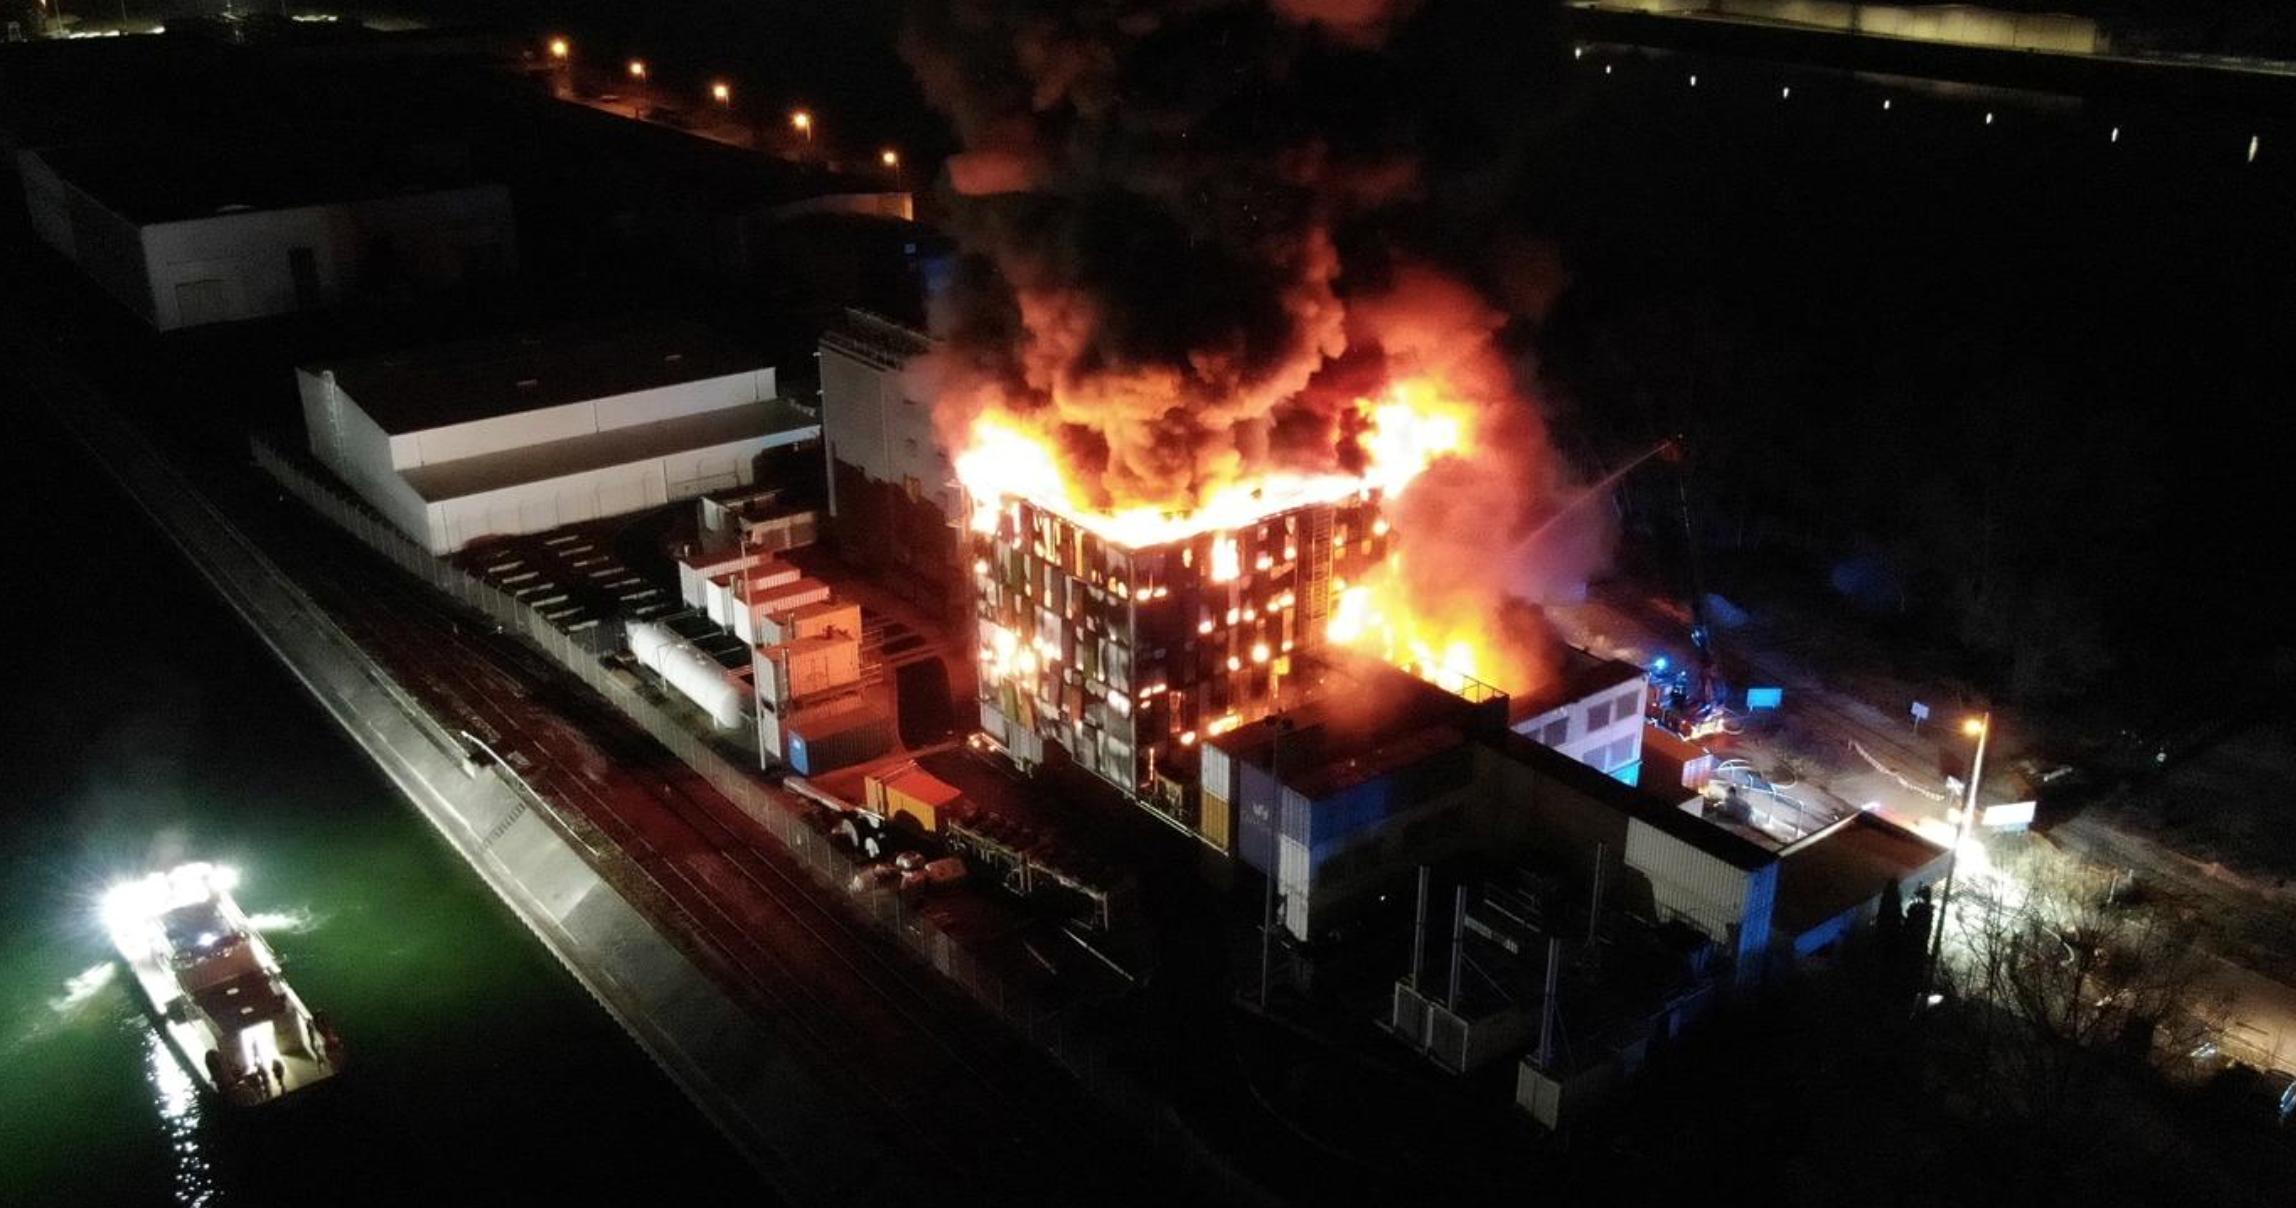 OVH 位于法国斯特拉斯堡发生了火灾,SBG2 数据中心被完全被烧毁!